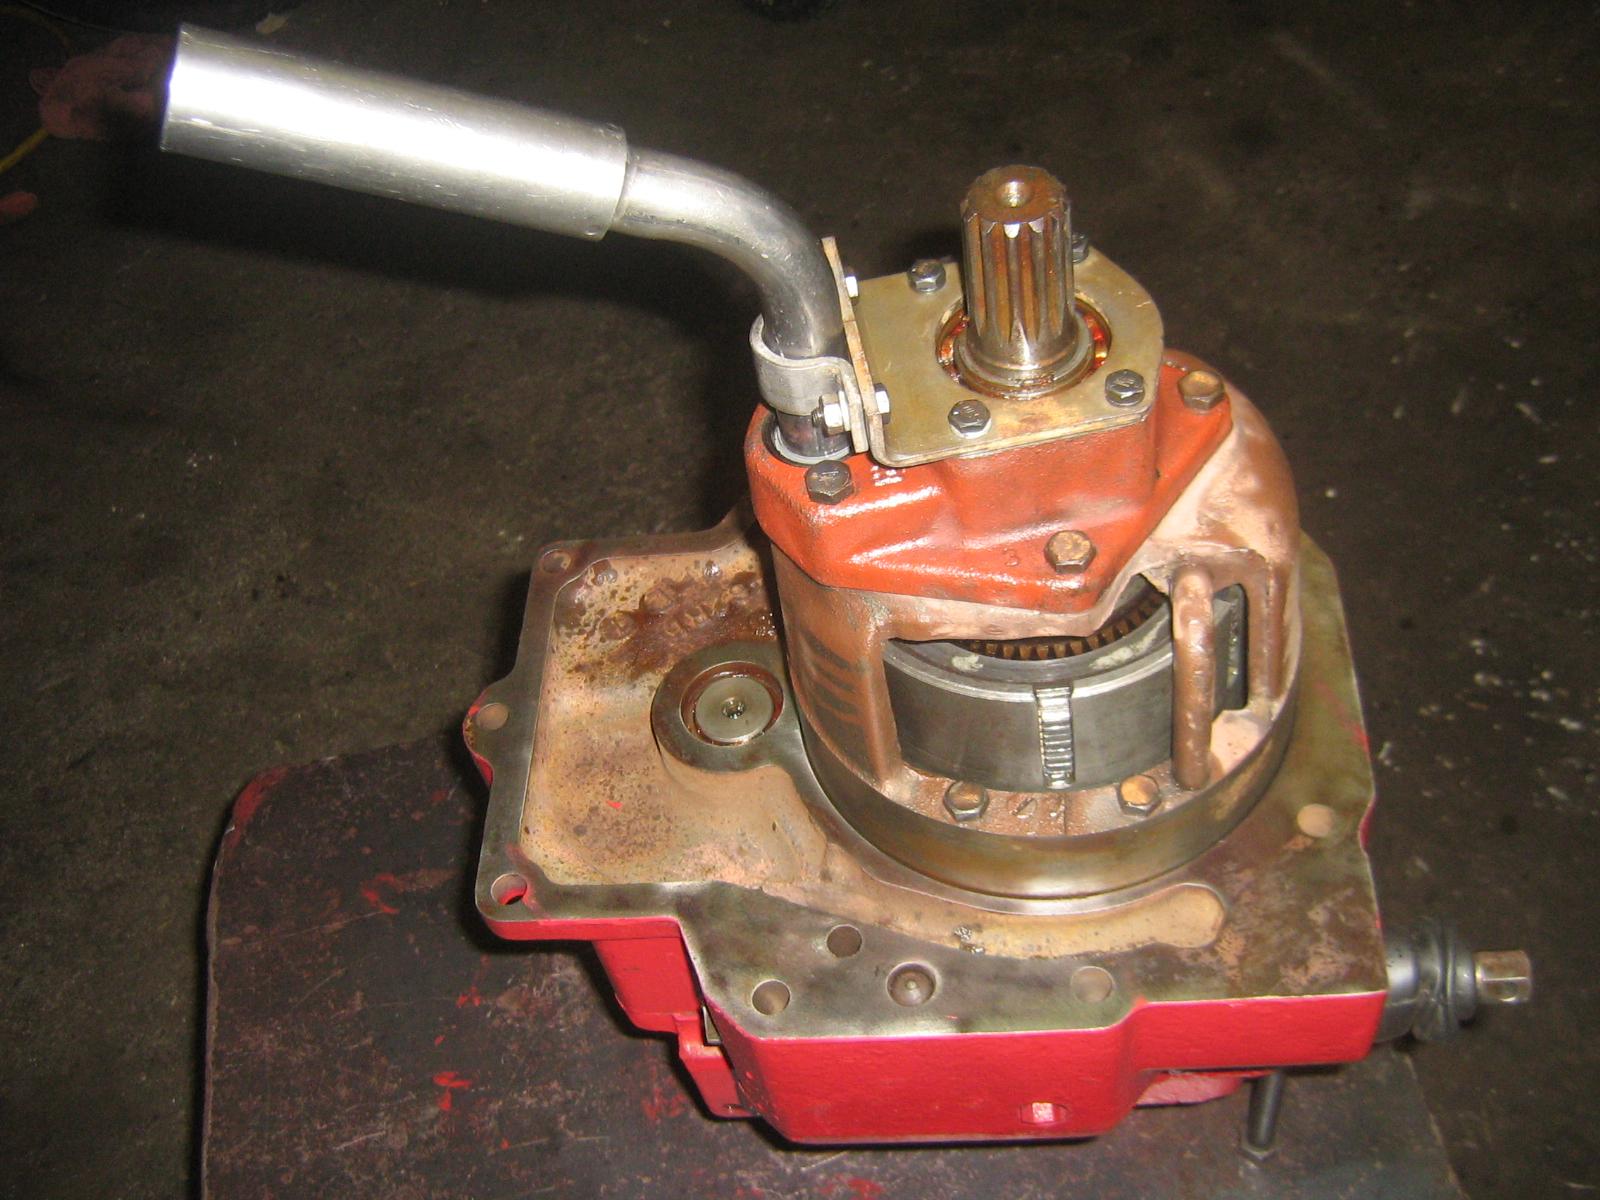 ih tractor pto unit repair information - redrunrite farmall 560 tractor wiring diagram